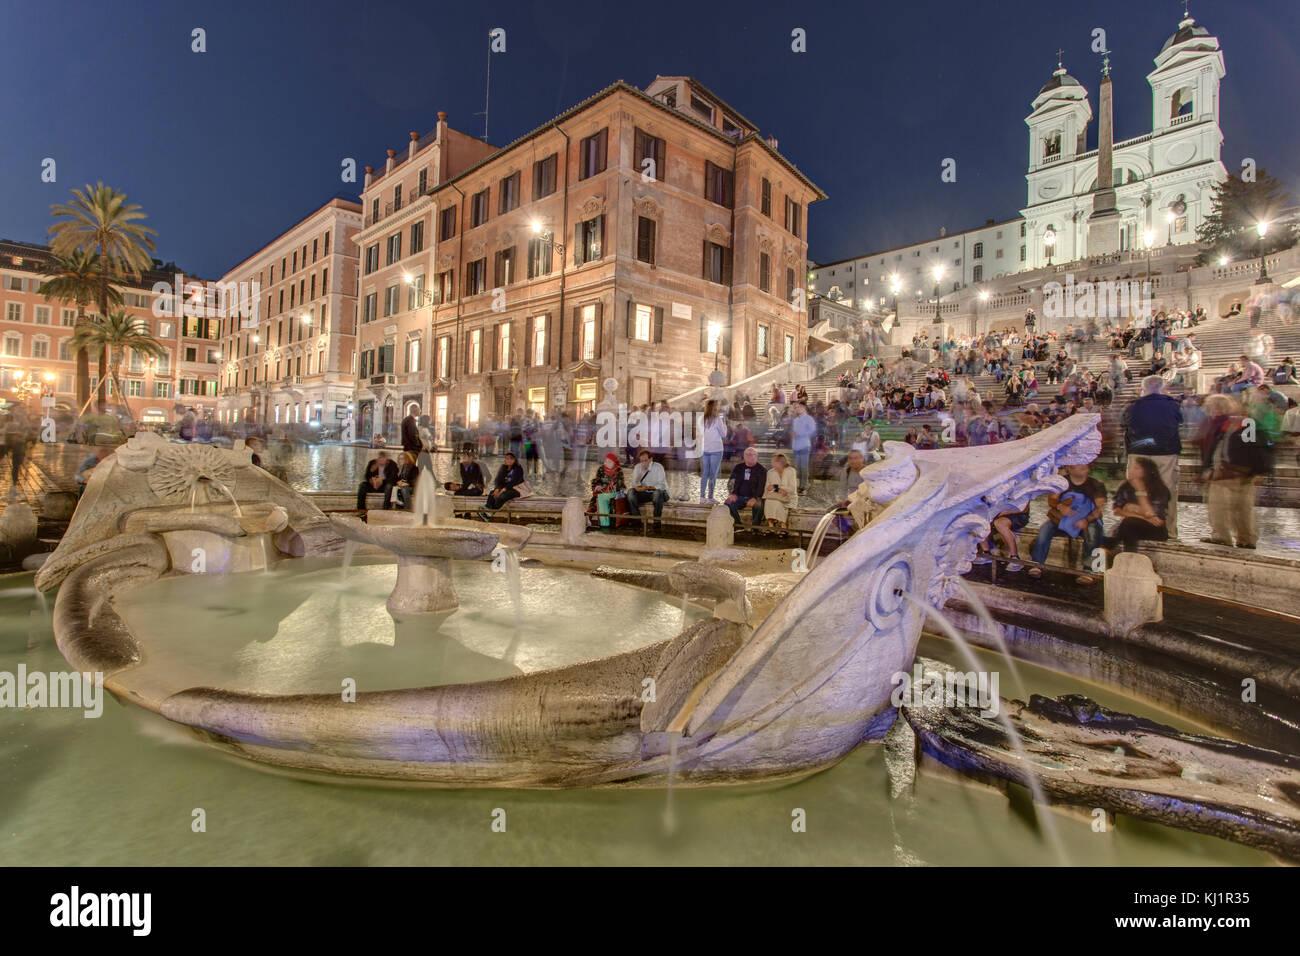 Spanish Steps, Rome - Piazza di Spagna Roma - Stock Image